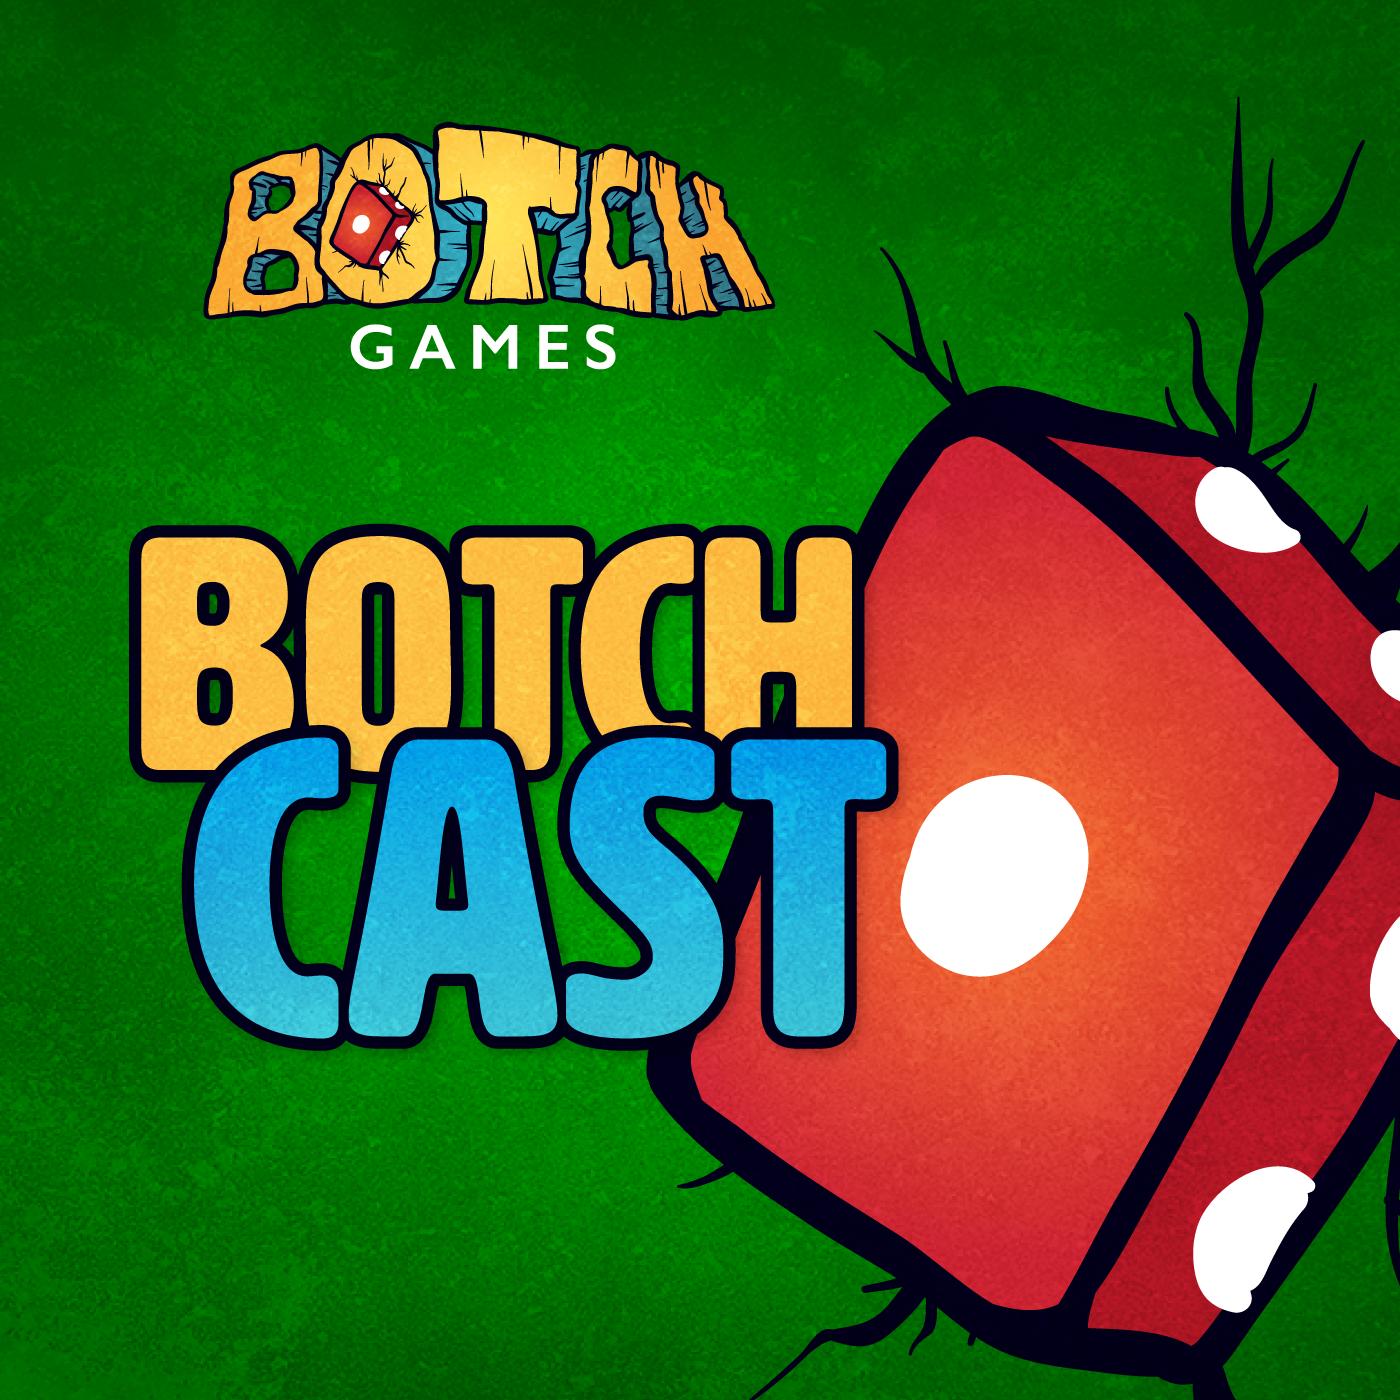 Botch Games - PodcastRating: PG